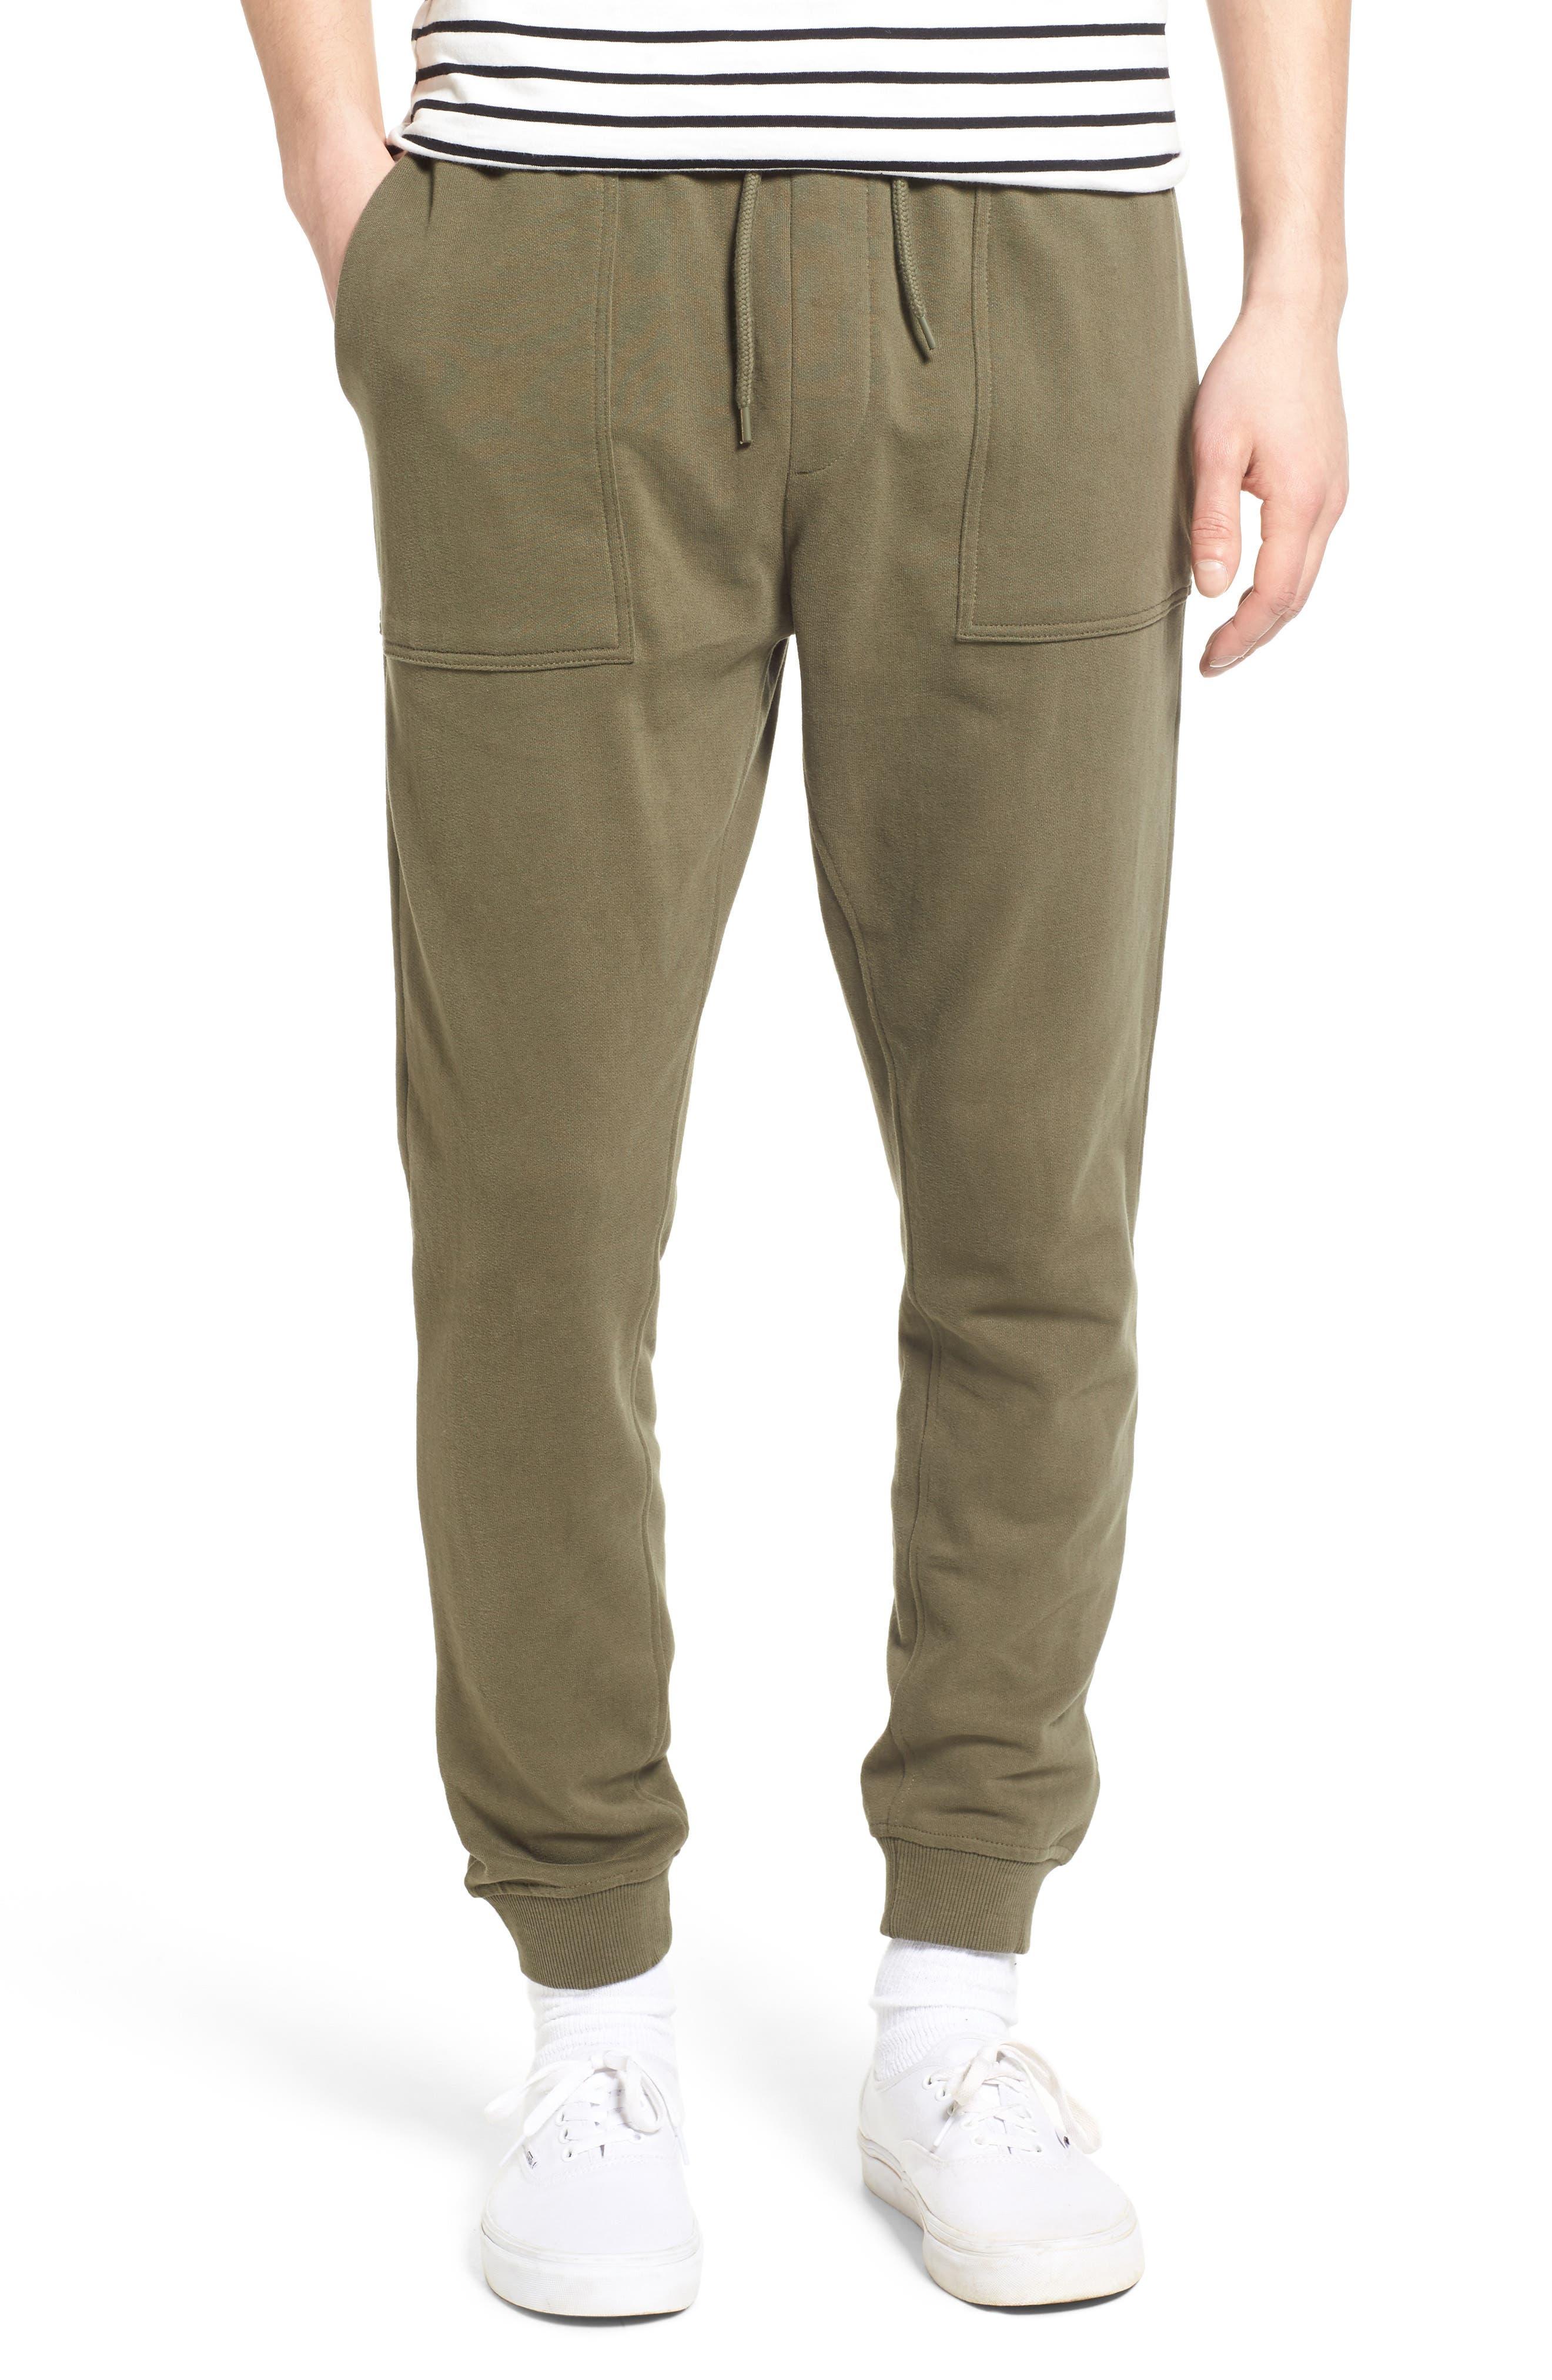 TOPMAN US Saint Jogger Pants